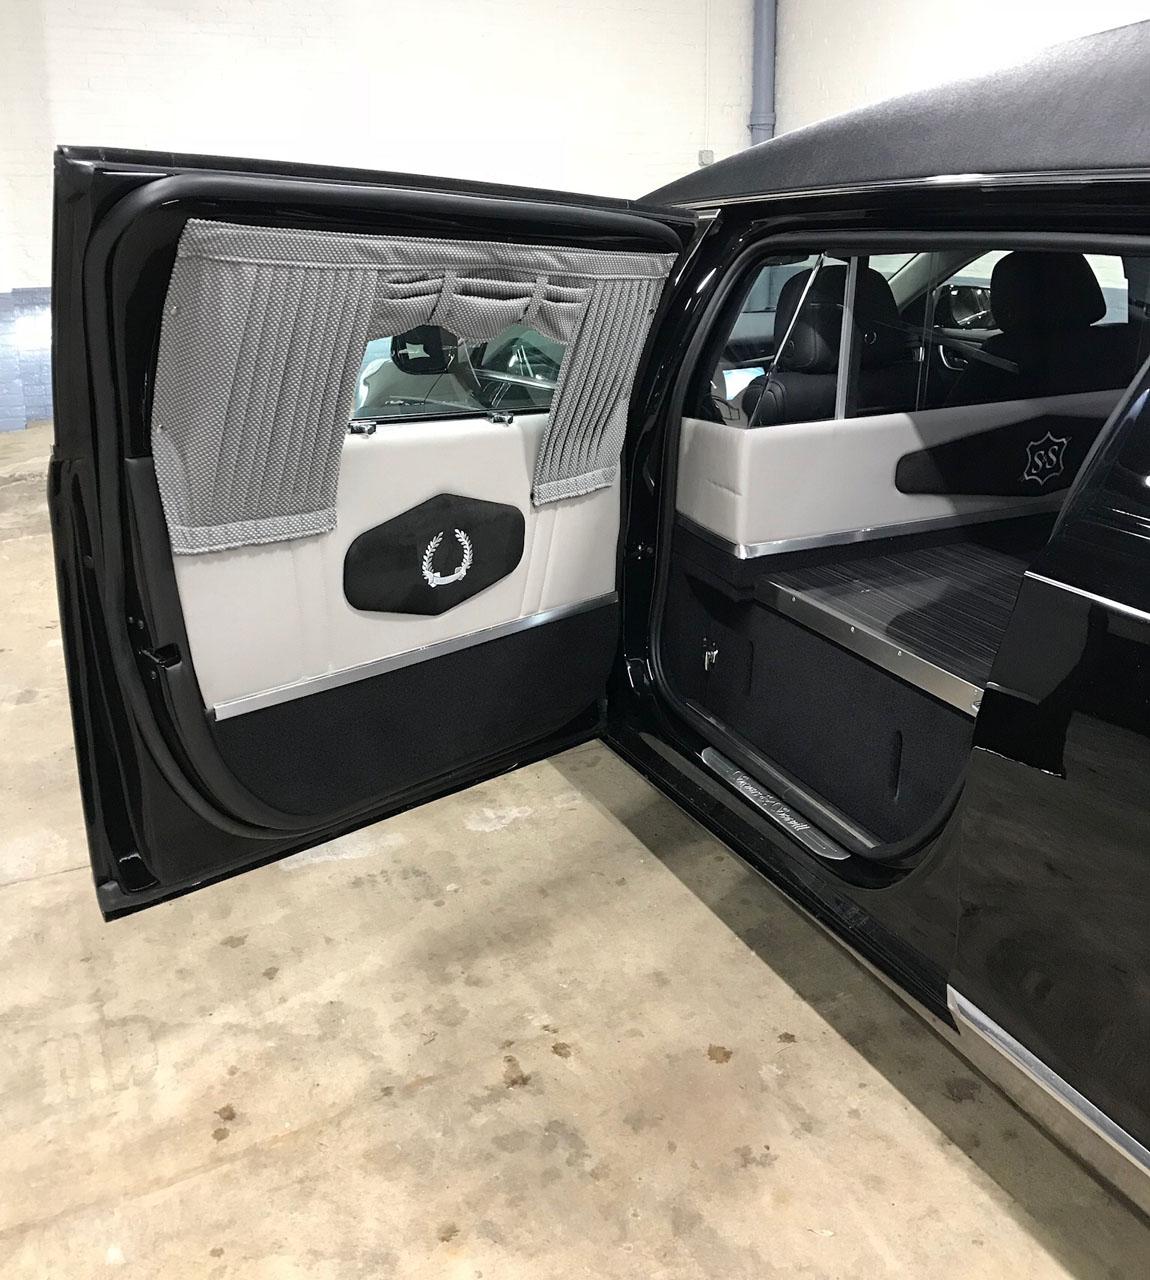 2019 Cadillac S Amp S Medalist Hearse